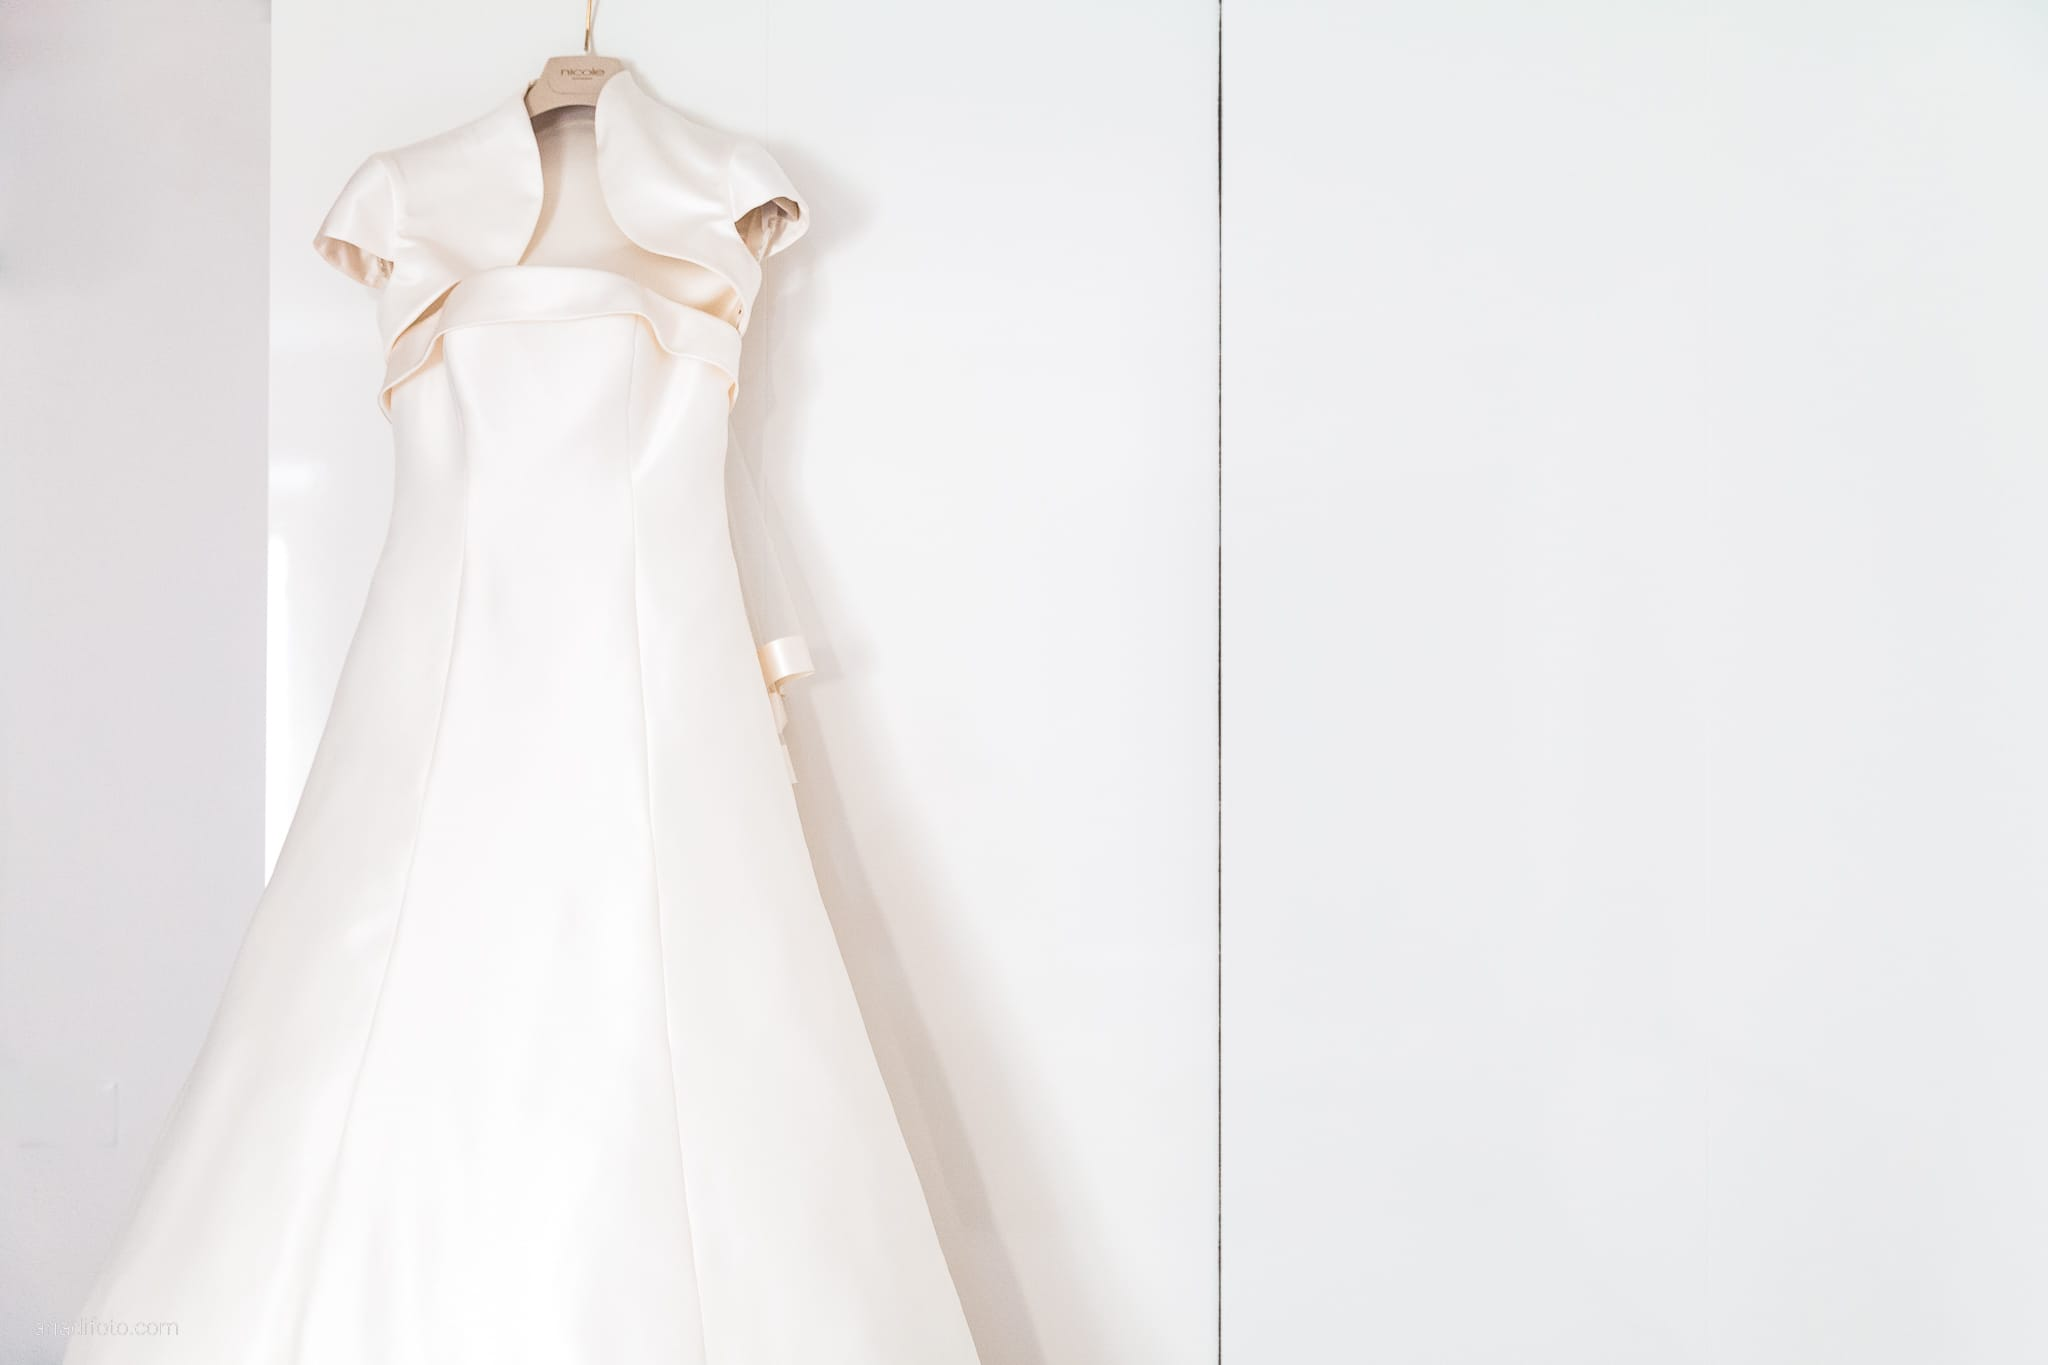 Camilla Giacomo matrimonio Duino Trieste Palazzo Lantieri Gorizia Farra preparativi abito